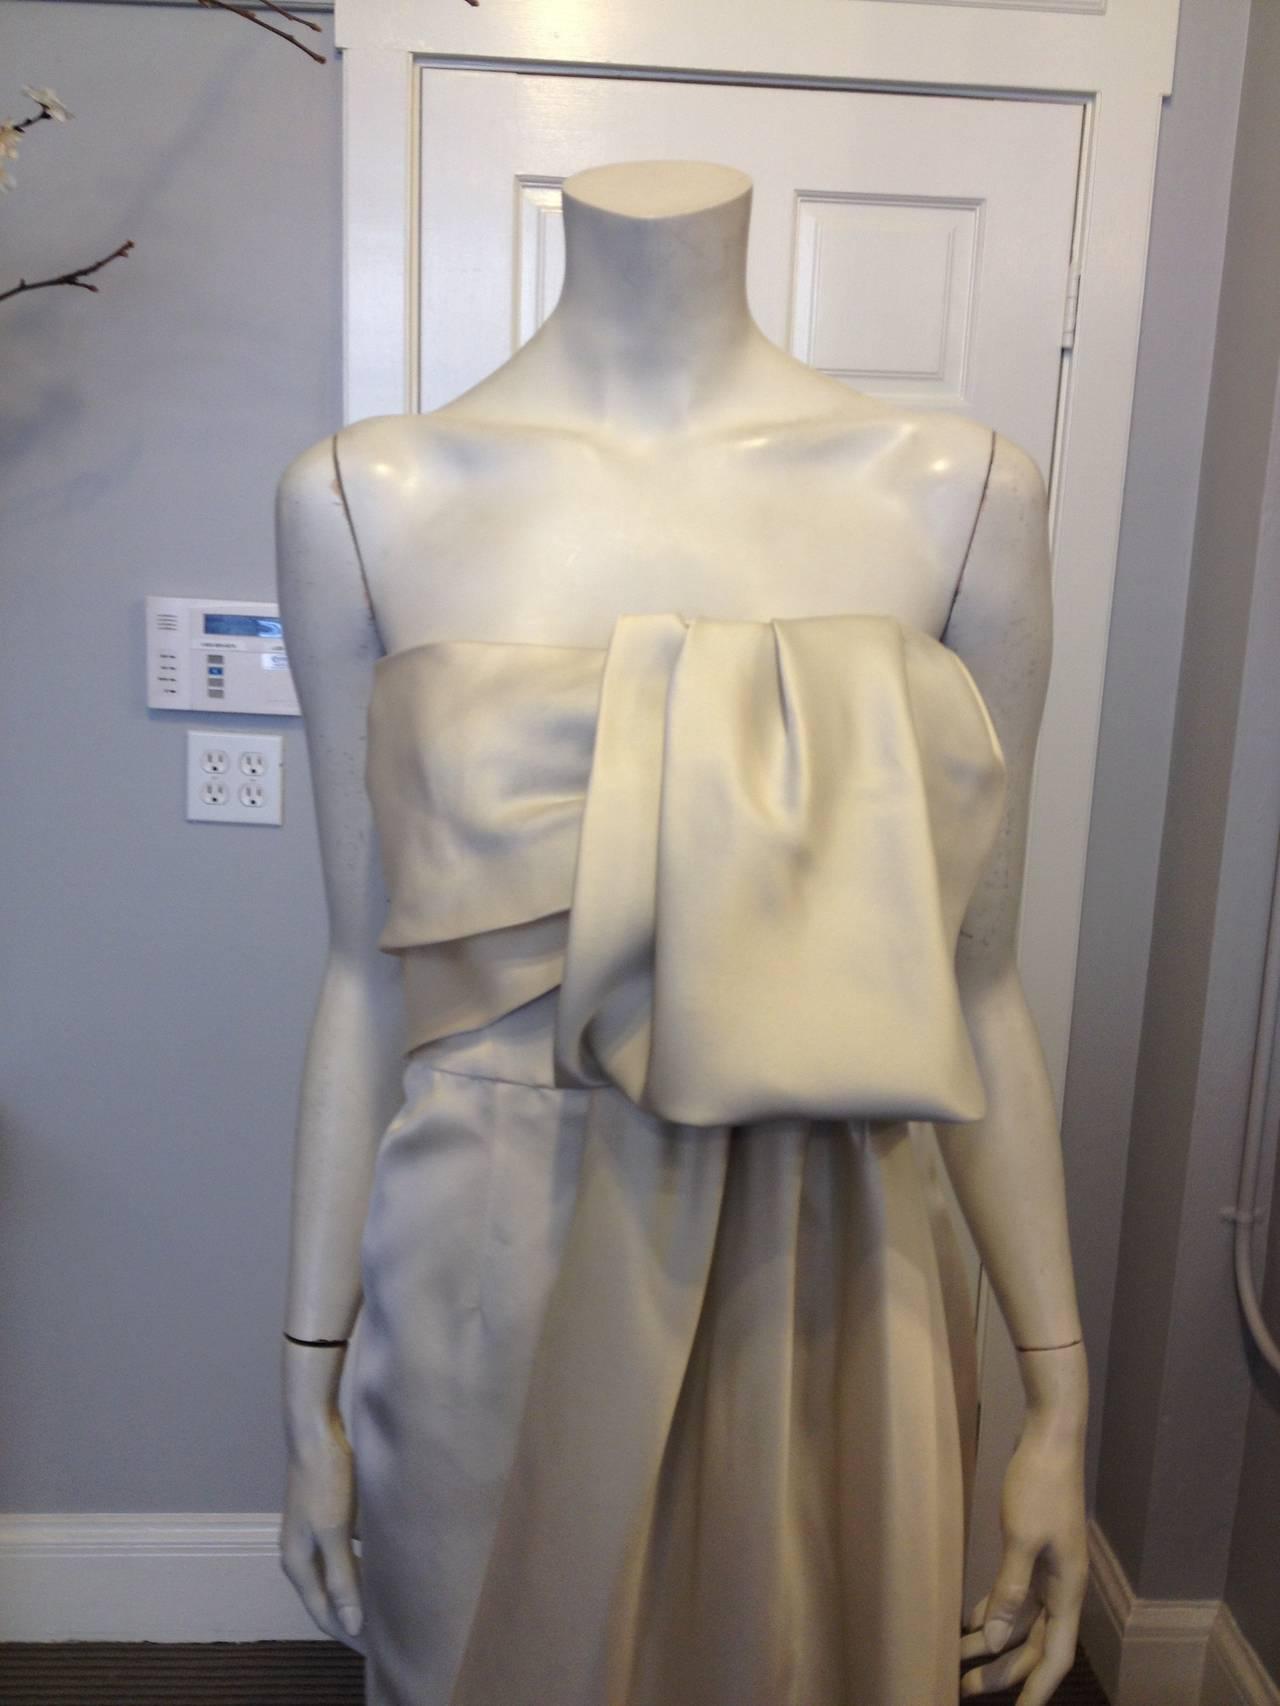 Prada Cream Satin Draping Demi-Couture Gown 2